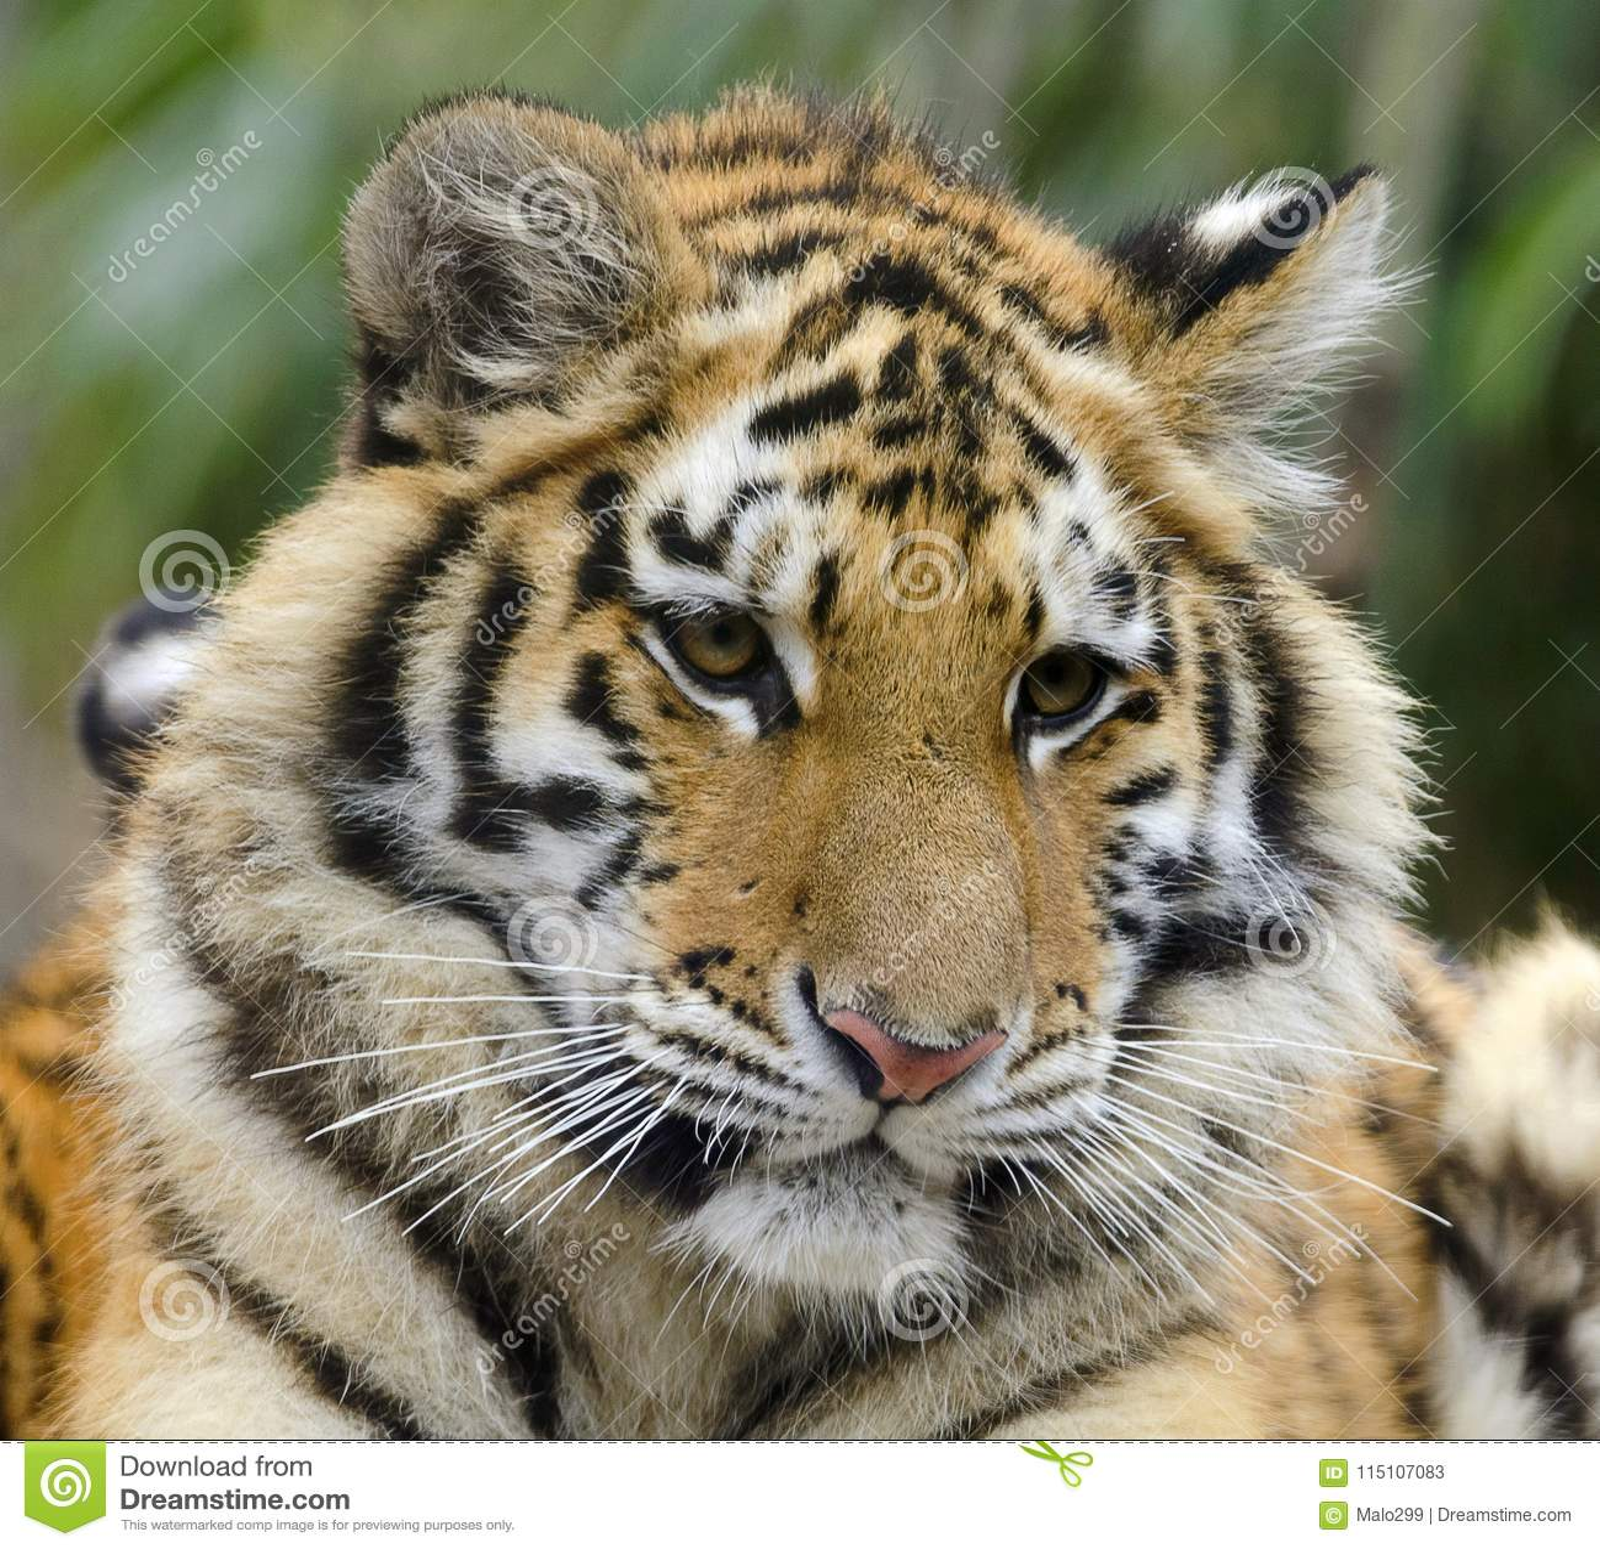 Cute tiger cub with pensive expression stock image image of download cute tiger cub with pensive expression stock image image of stripes immature altavistaventures Images